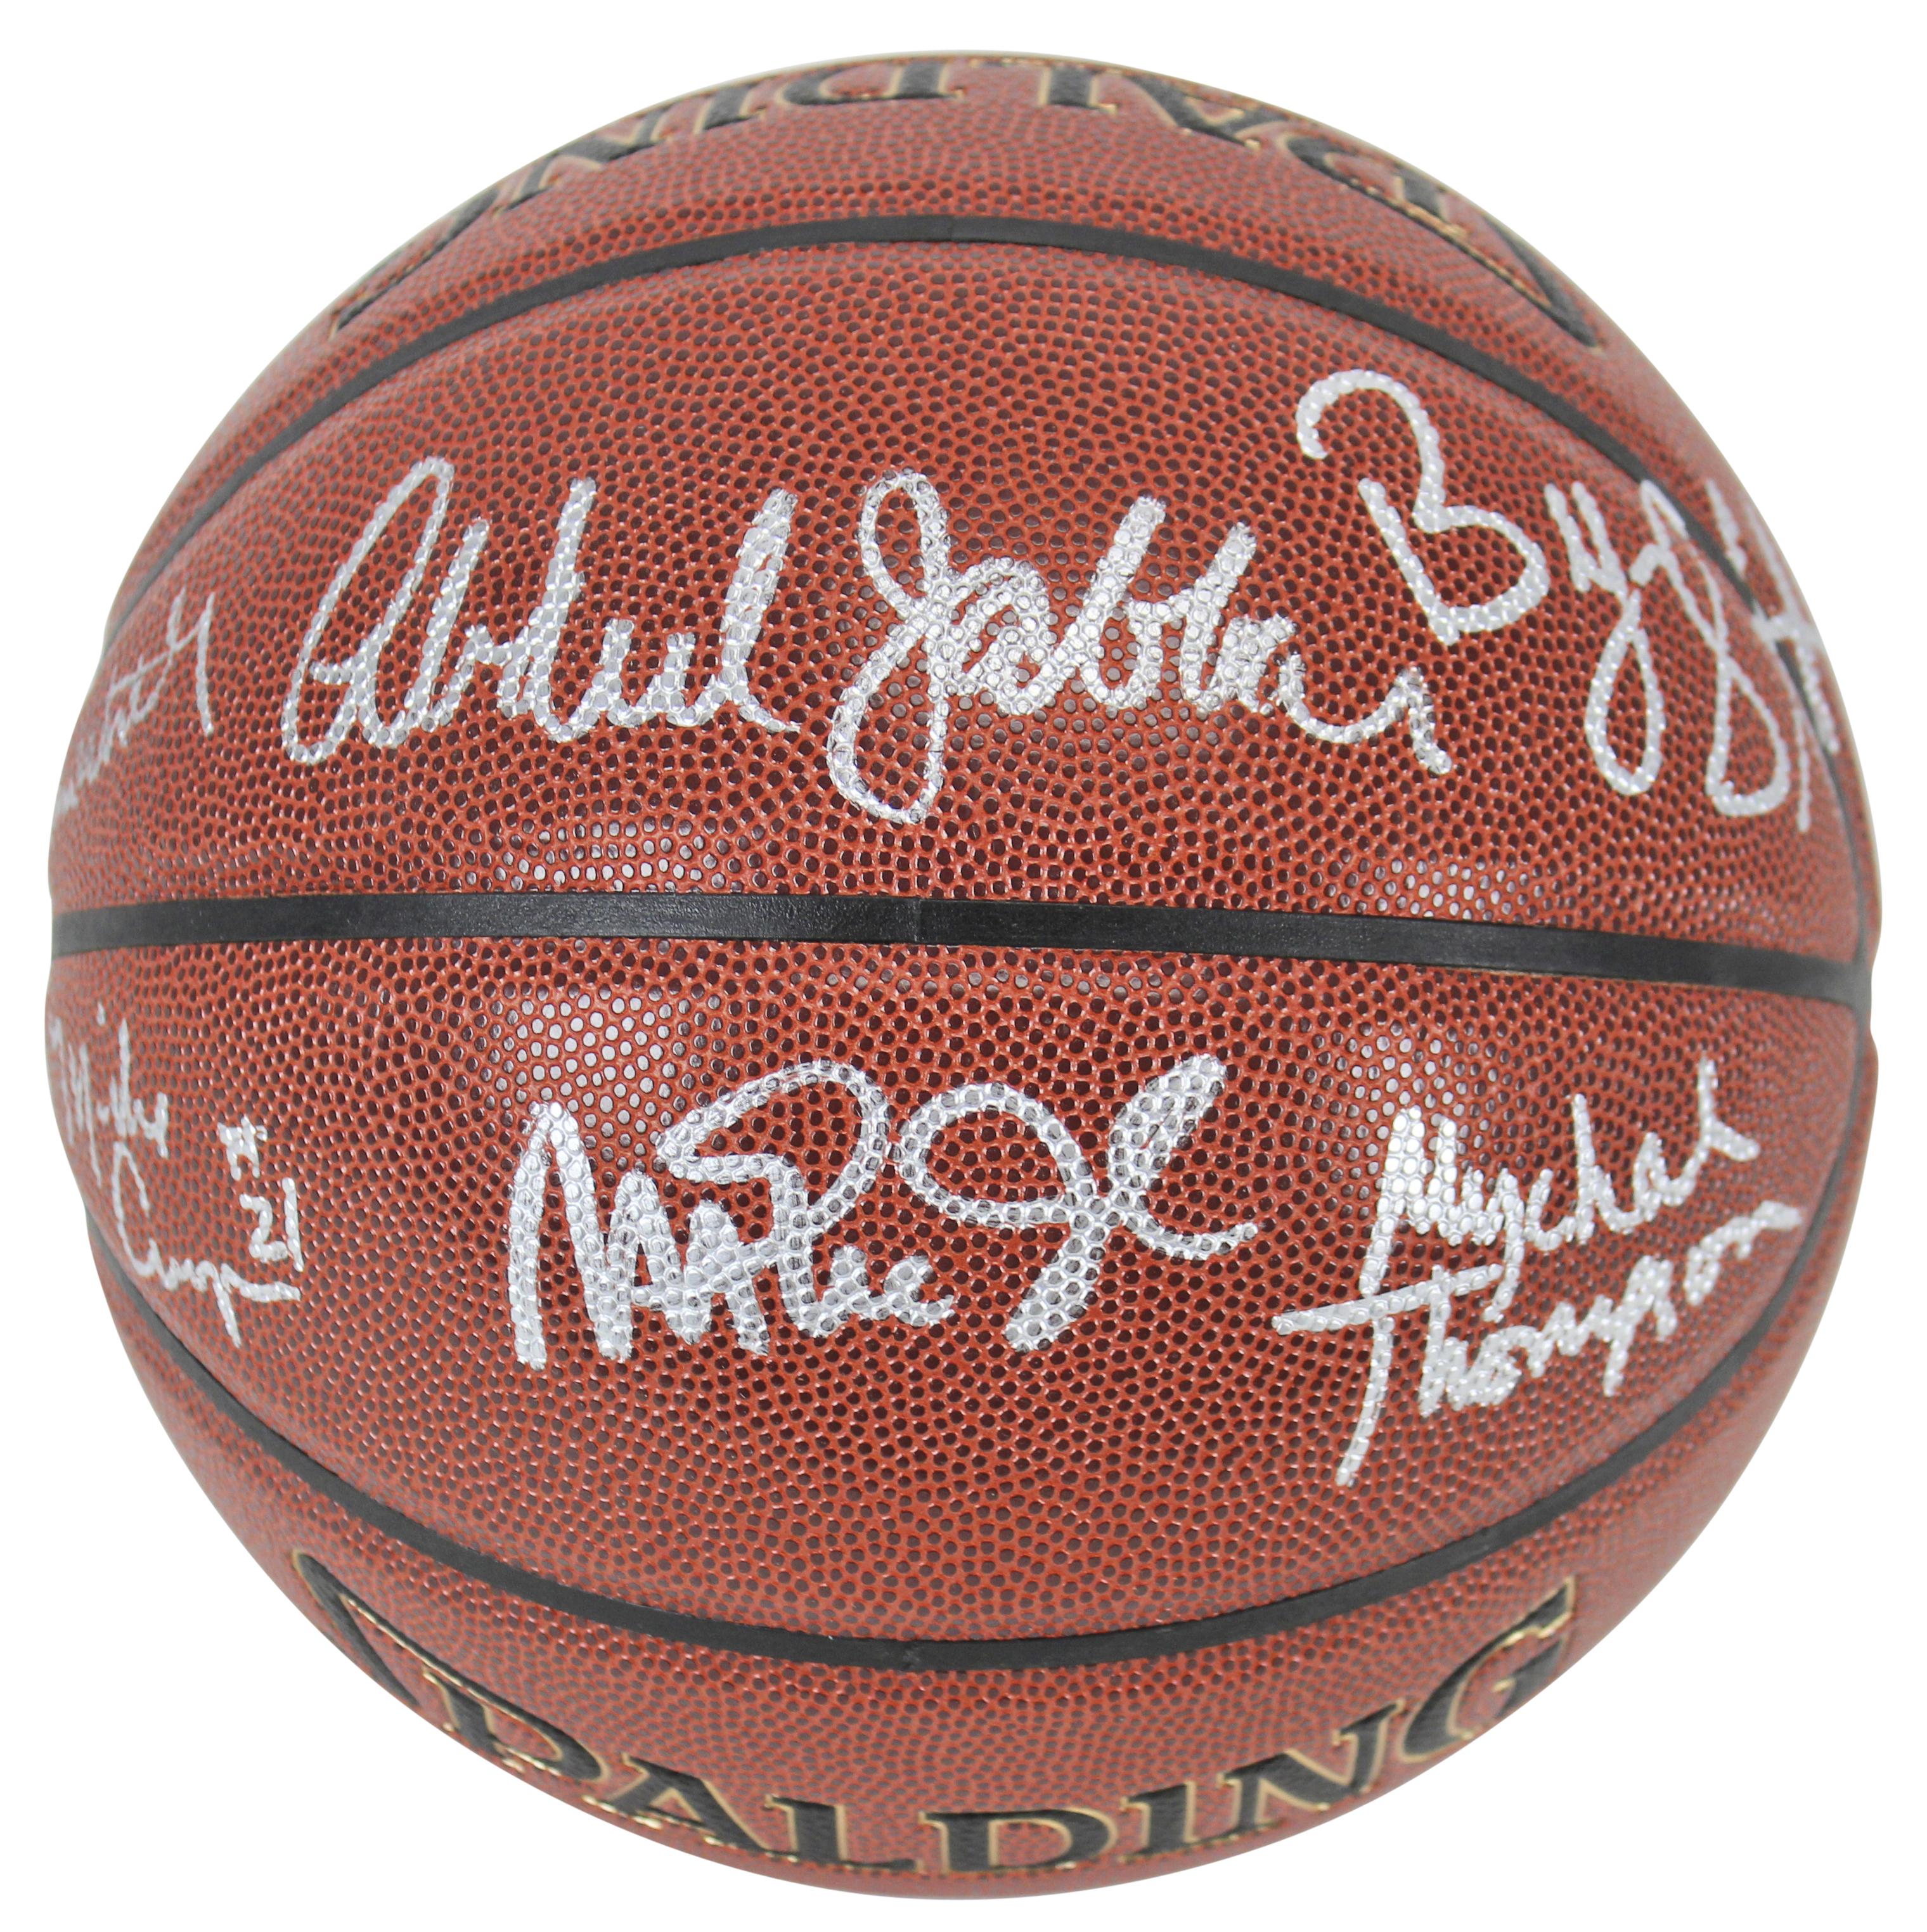 1c8ec047 Lakers Showtime (6) Magic, Jabbar, Worthy, Scott Signed Basketball ...